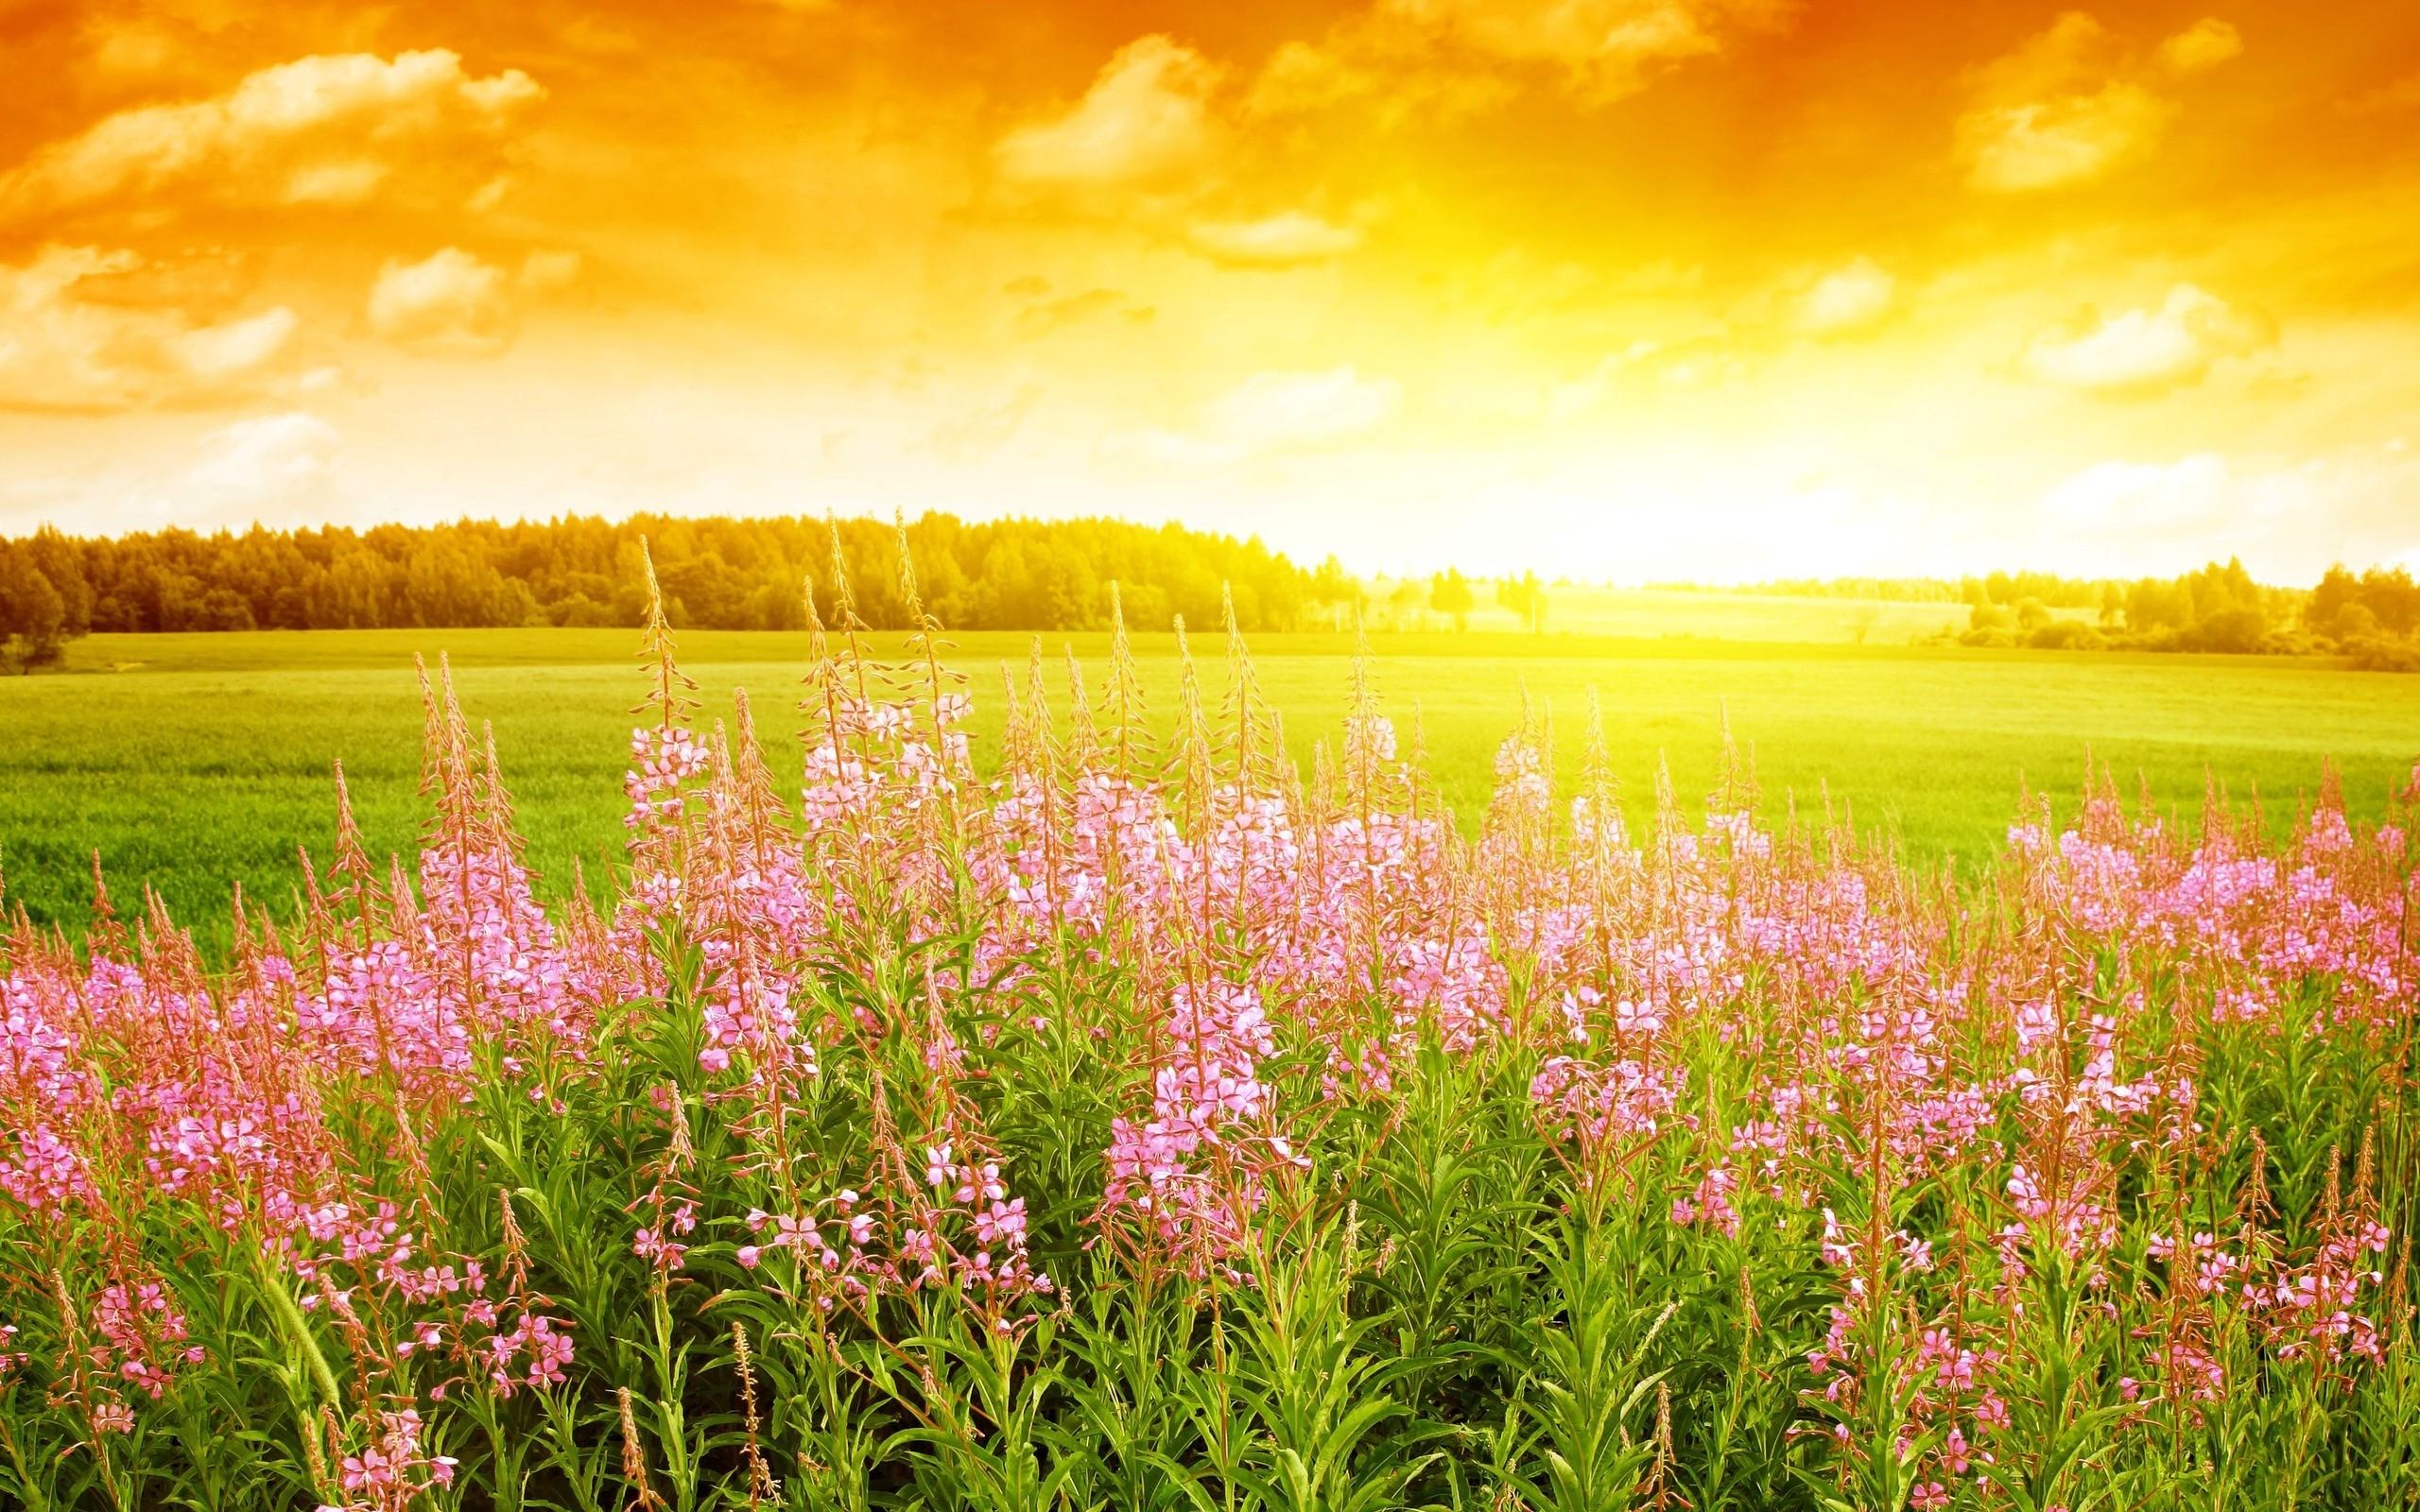 Spring HD Desktop Wallpaper.